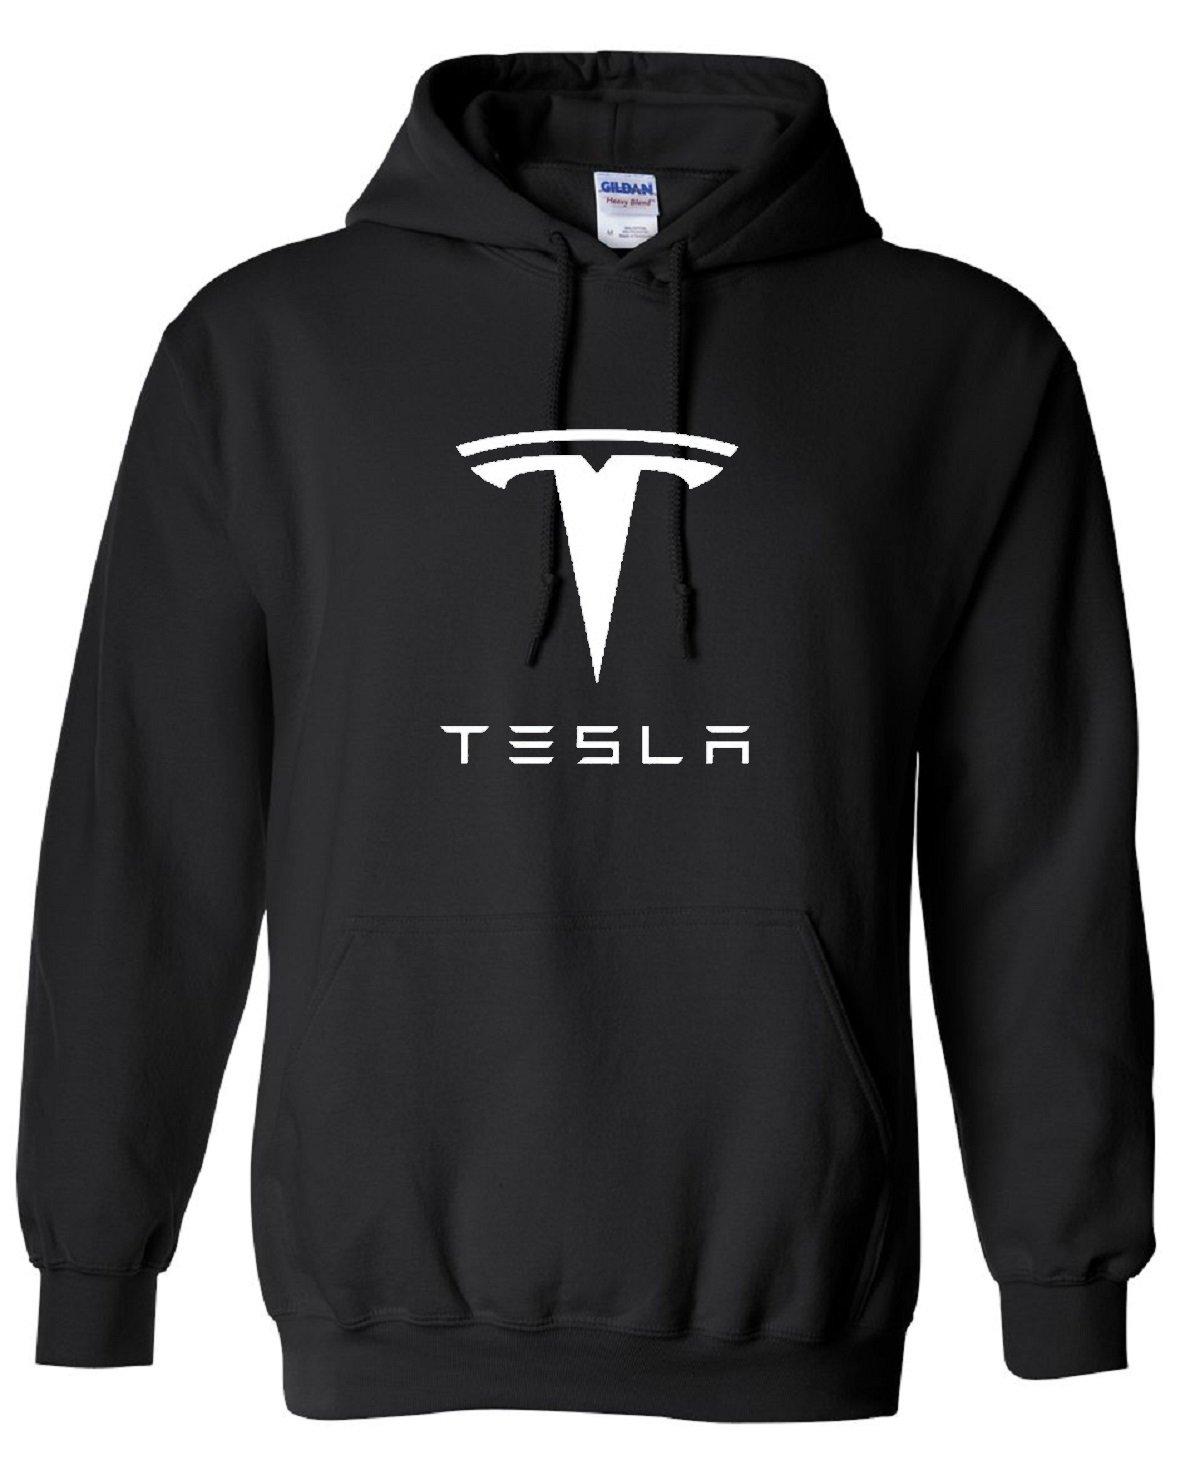 Tesla Motors Car Auto Electric Automobile Inspired Hoodie, Kids, Years 9-11